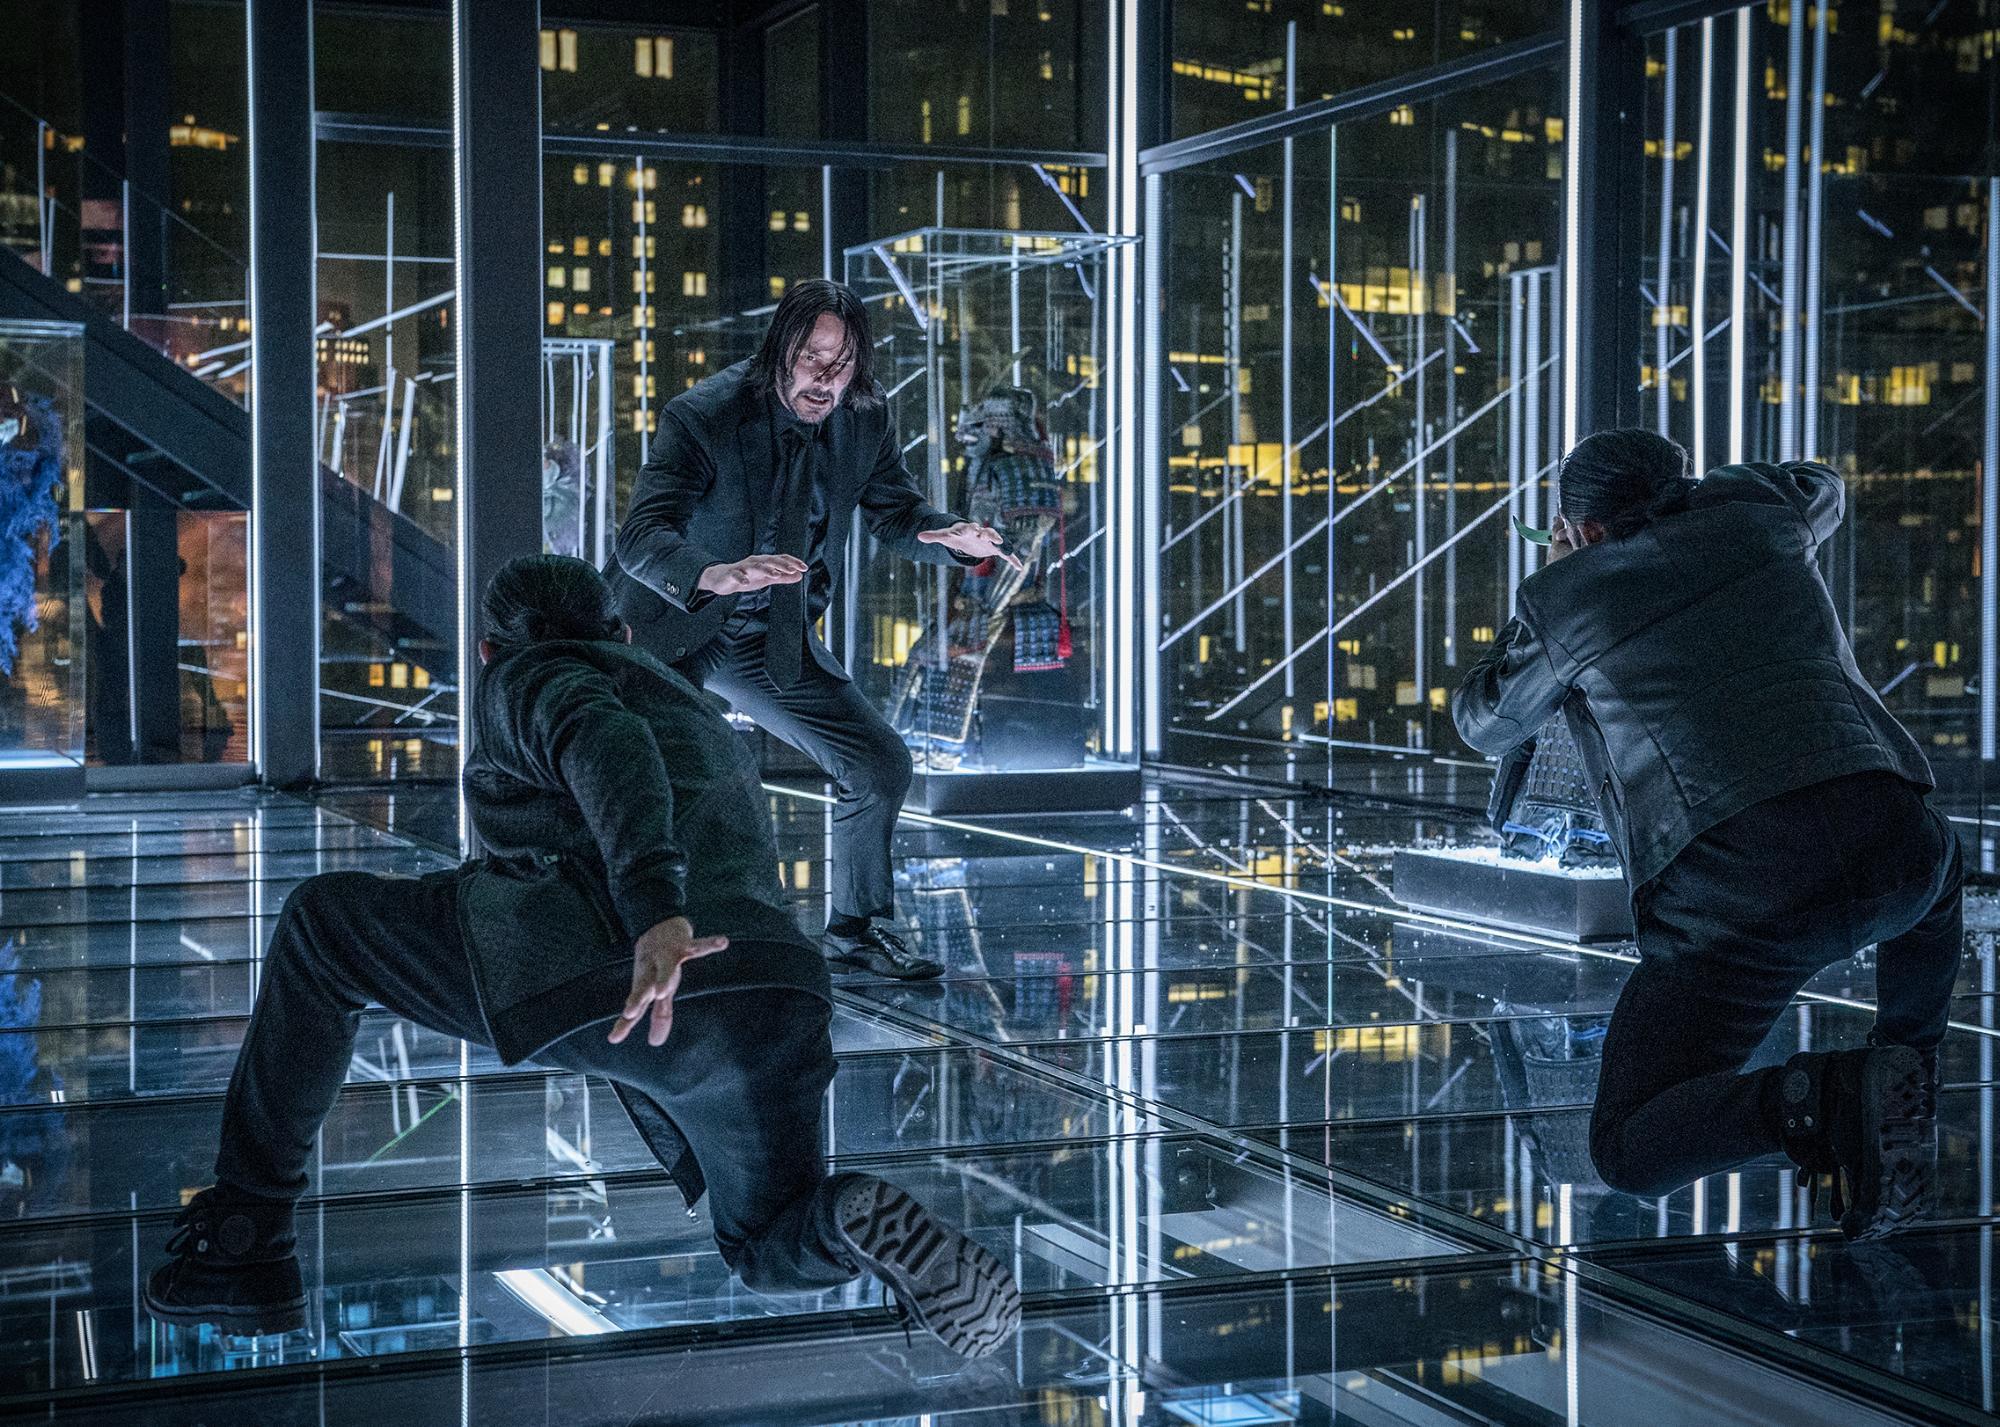 John Wick: Chapter 3 - Parabellum at an AMC Theatre near you